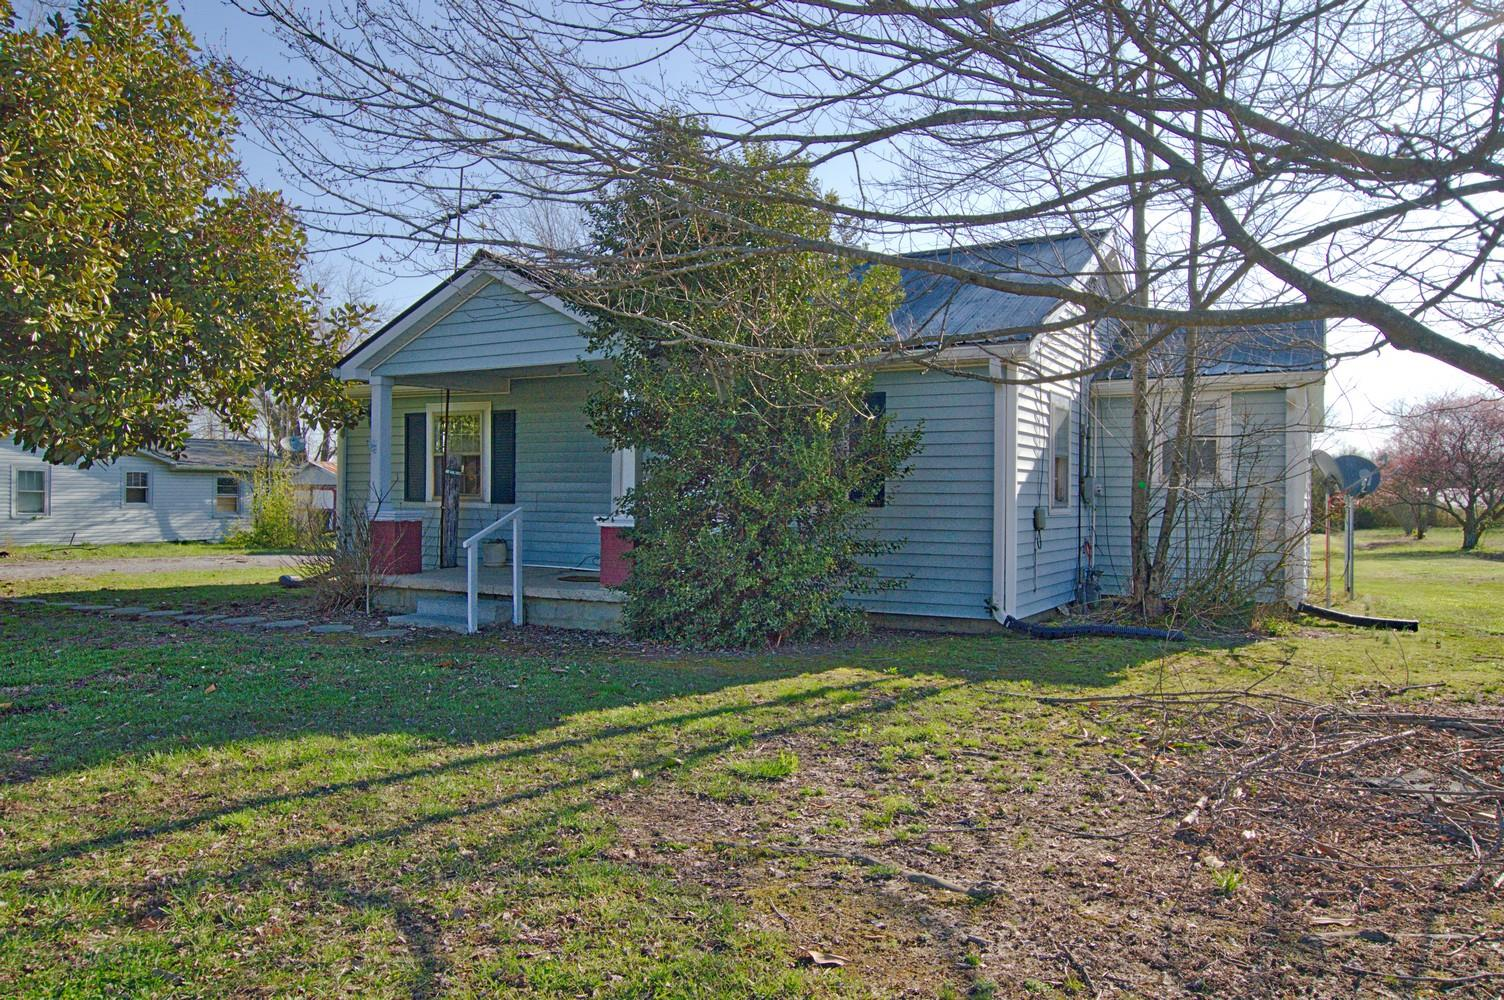 6119 Jim Cummings Hwy, Woodbury, TN 37190 - Woodbury, TN real estate listing